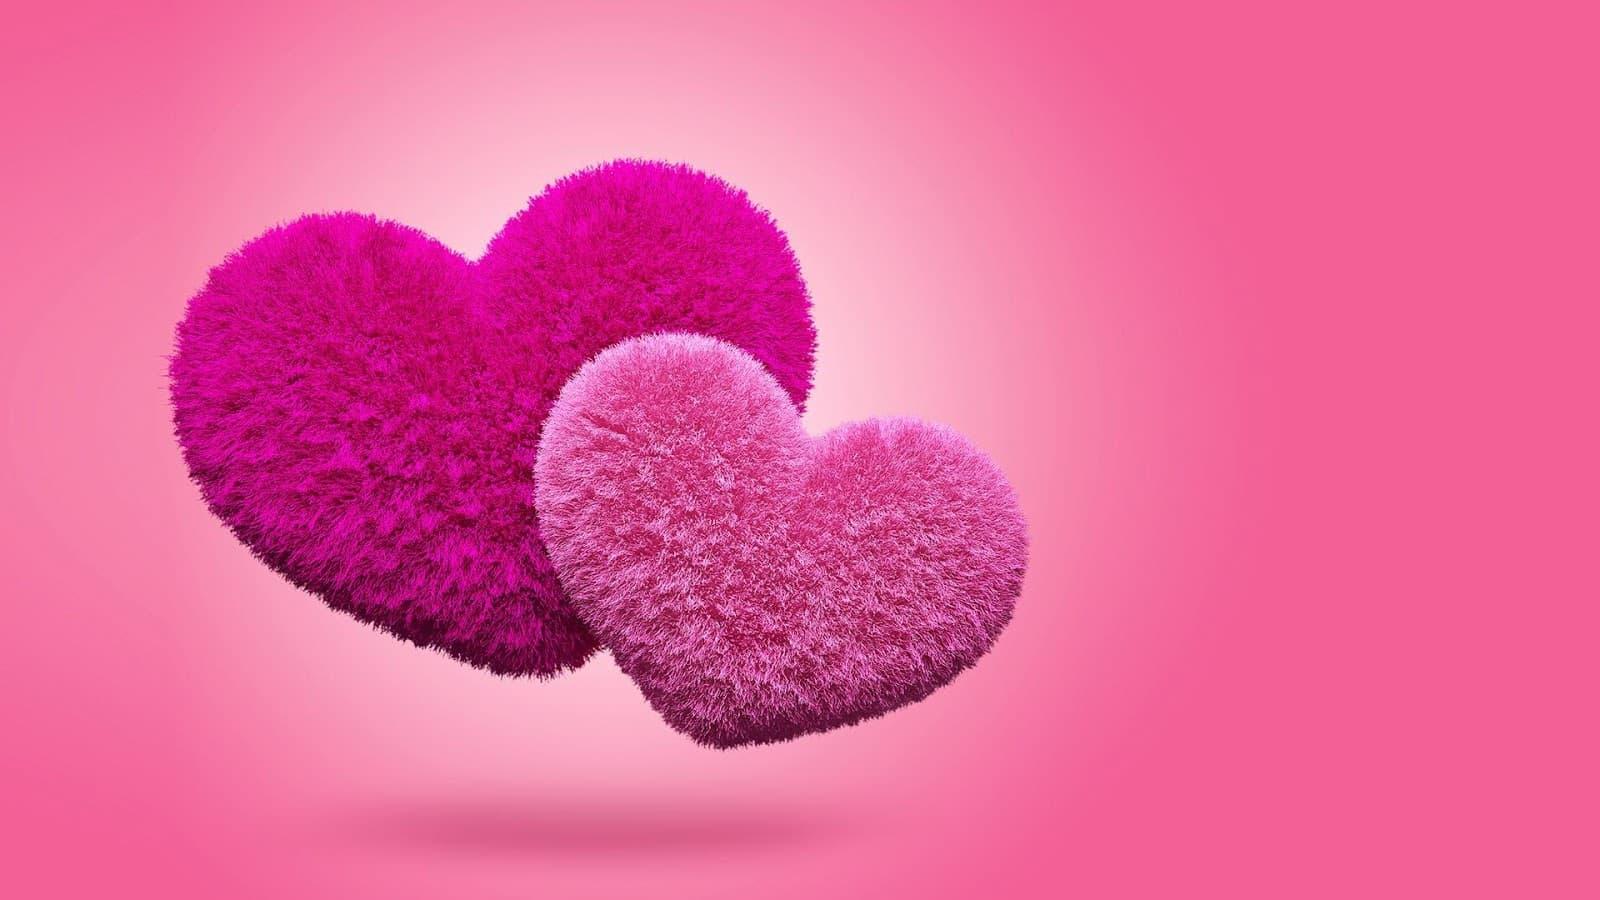 Top 20 R Wallpaper Love: Beautiful Heart Wallpapers